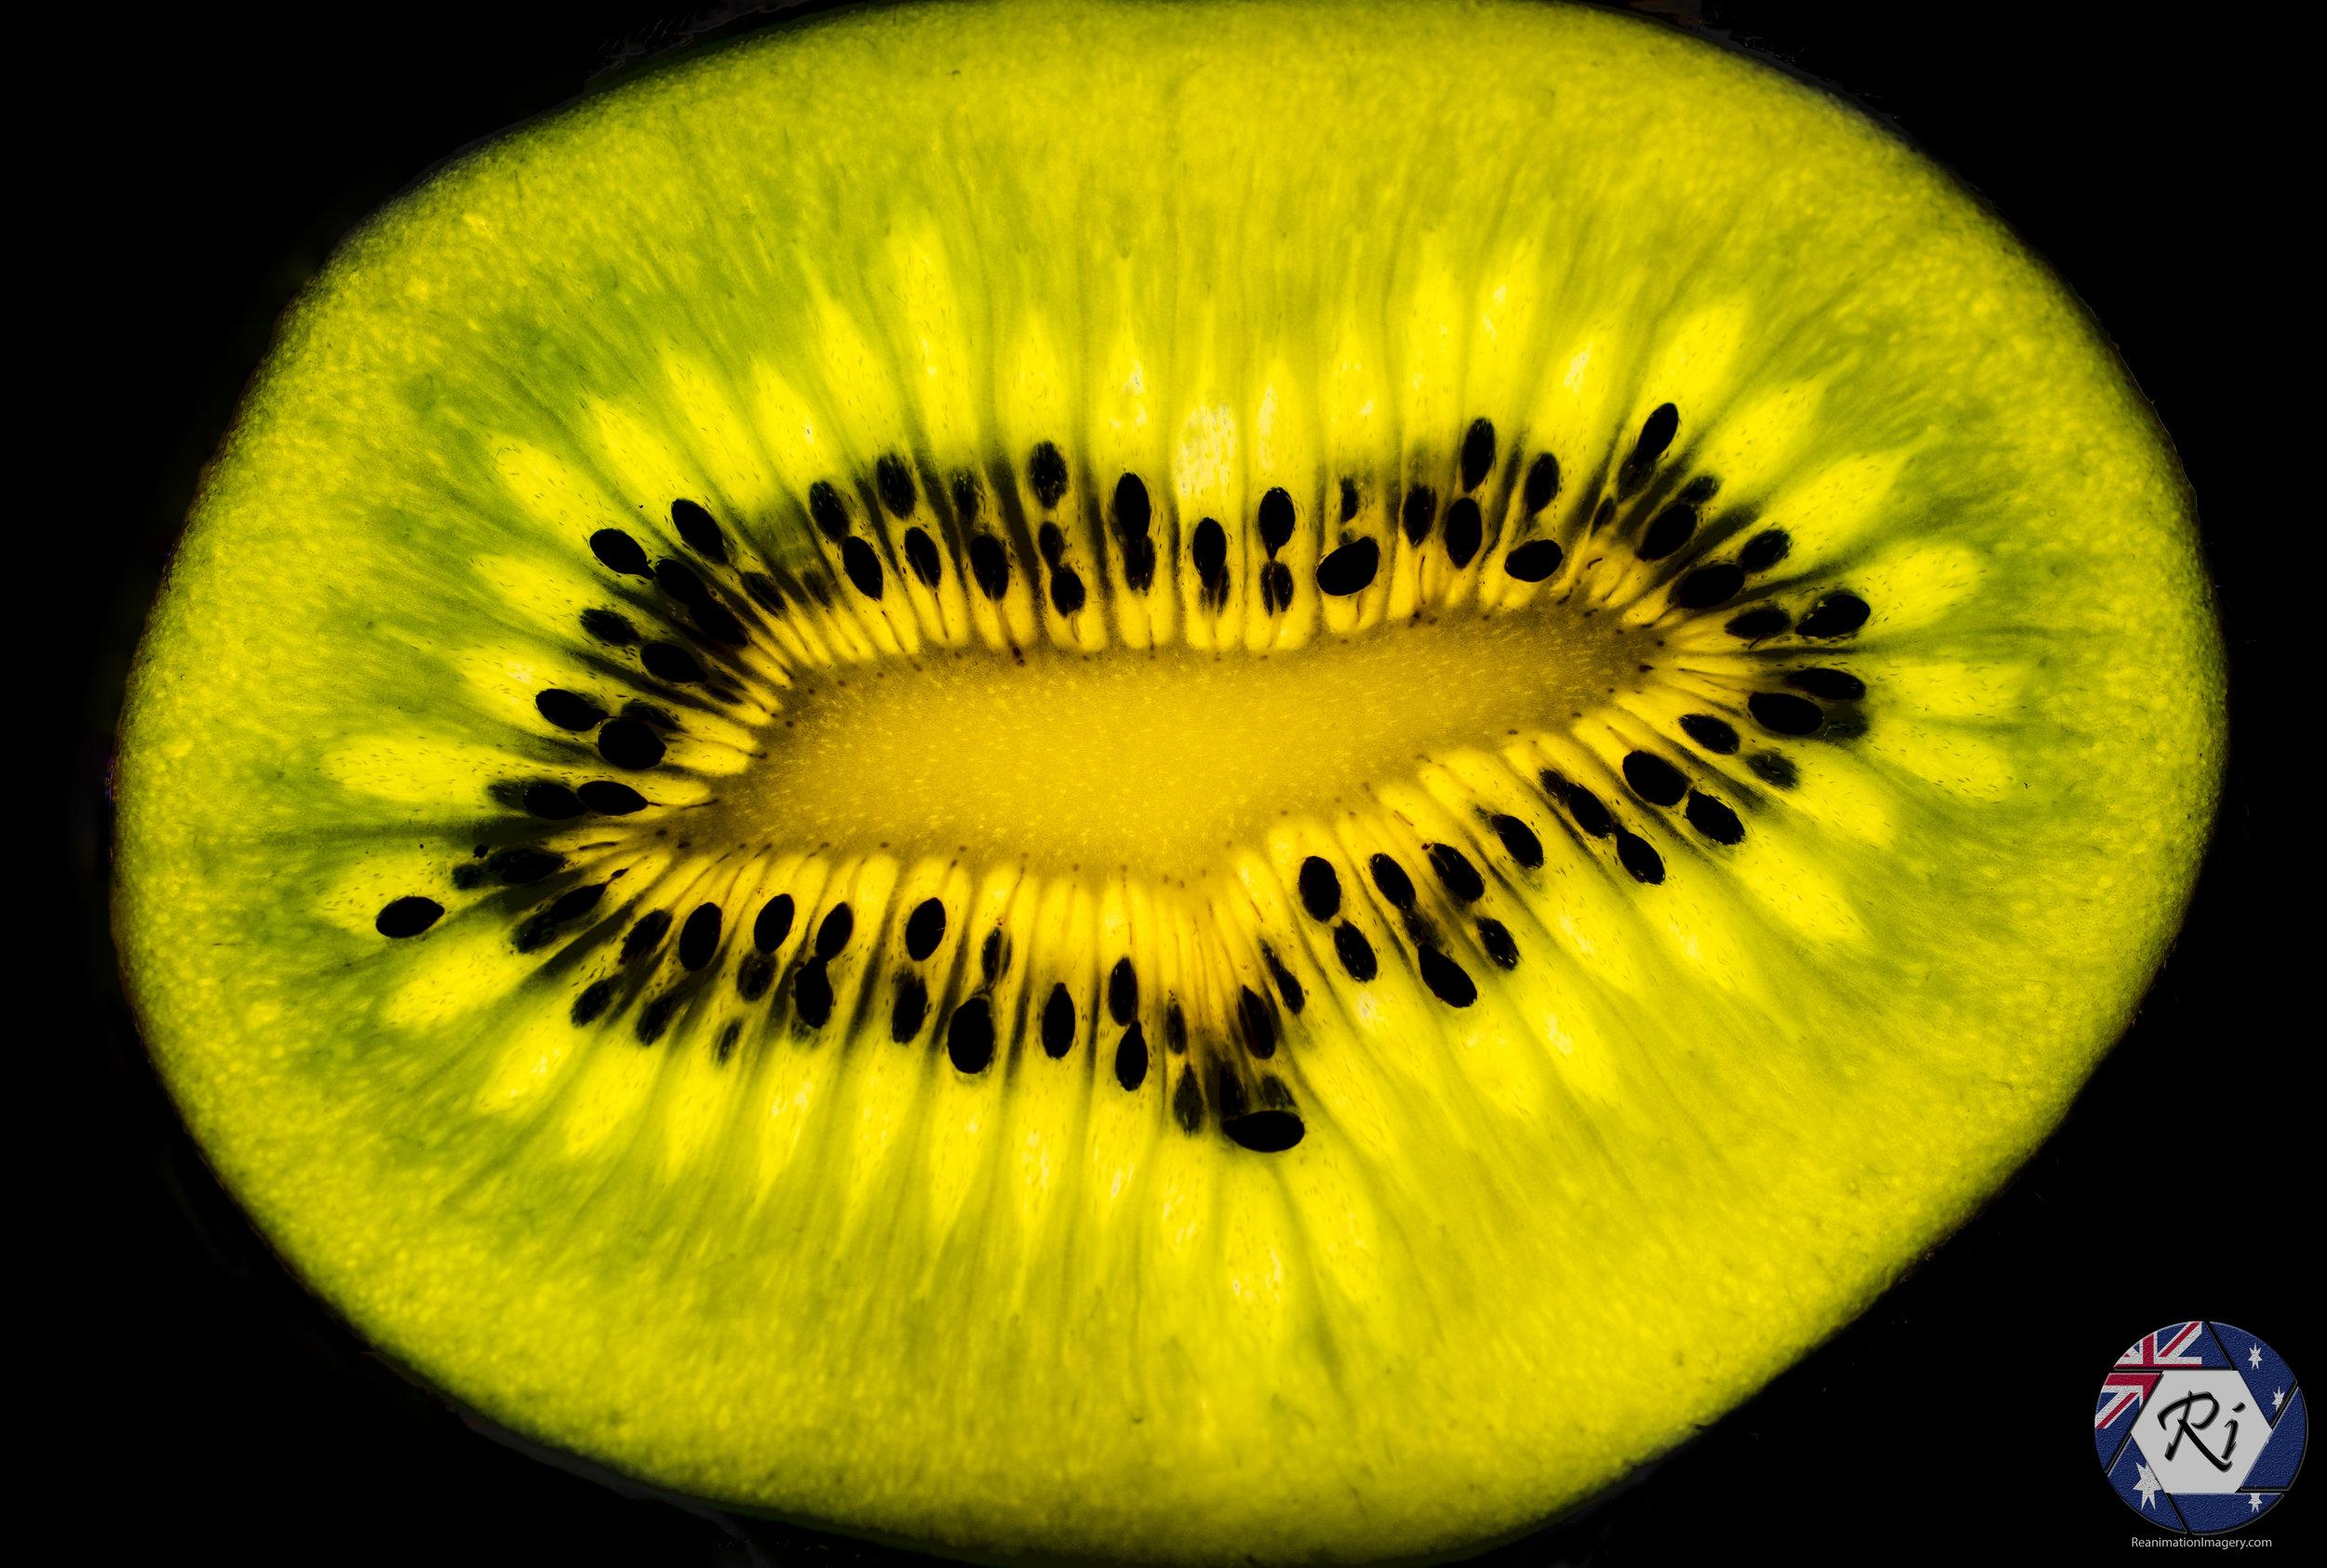 stock-photo-kiwi-fruit-86378679.jpg